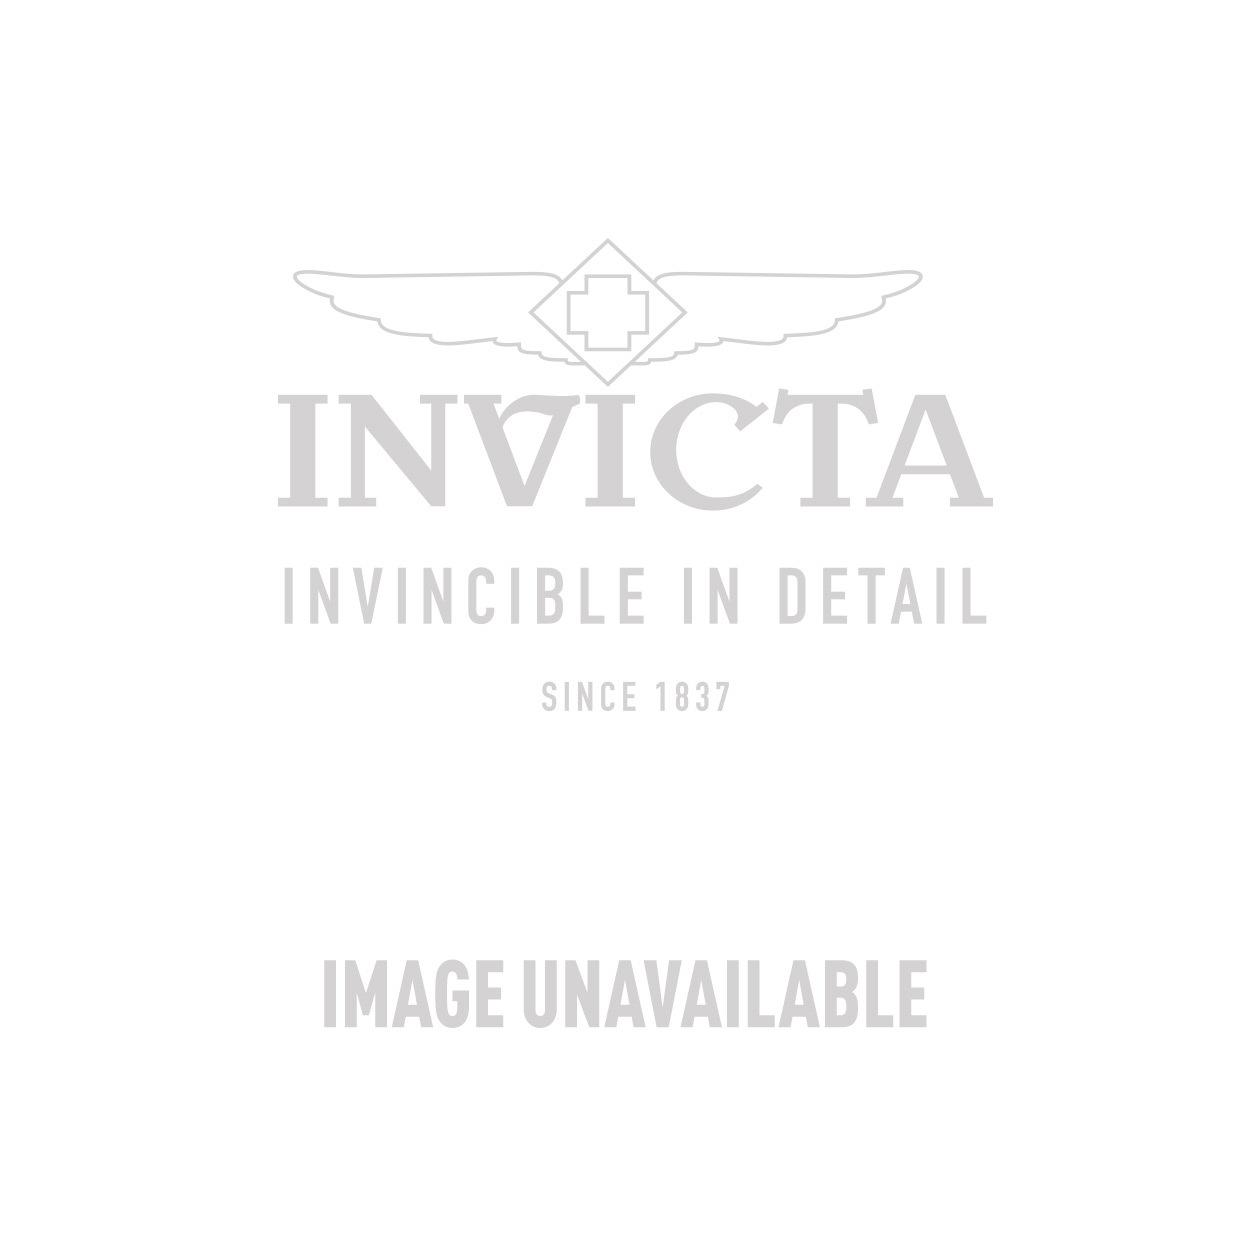 Invicta Pro Diver Quartz Watch - Gold, Black case with Black tone Polyurethane band - Model 17814